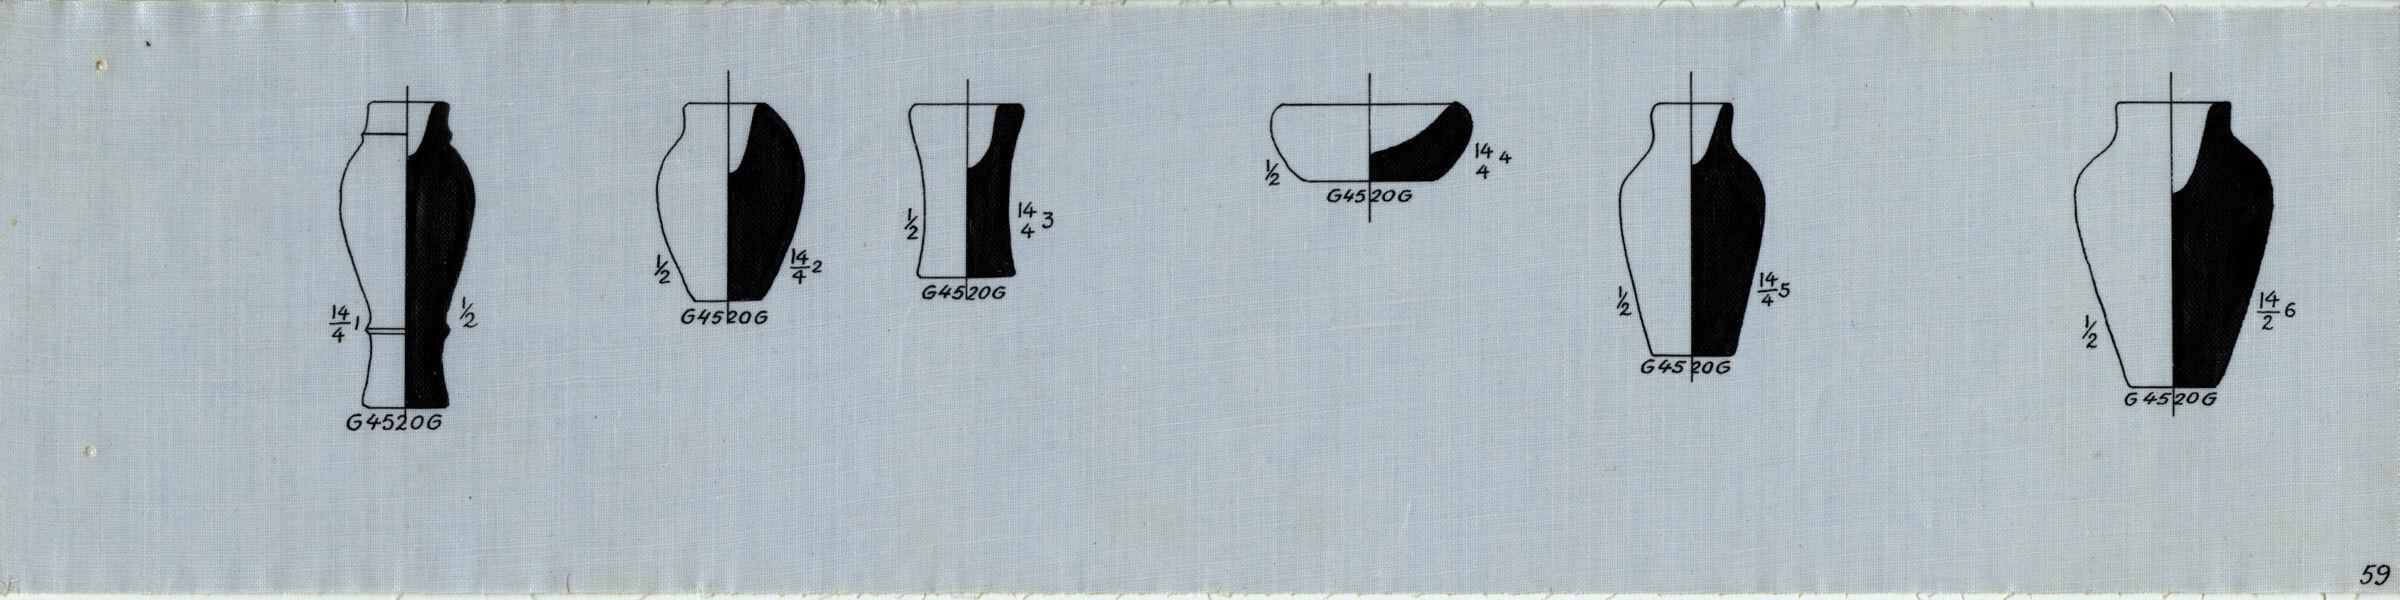 Drawings: G 4520, Shaft b: pottery, model jars